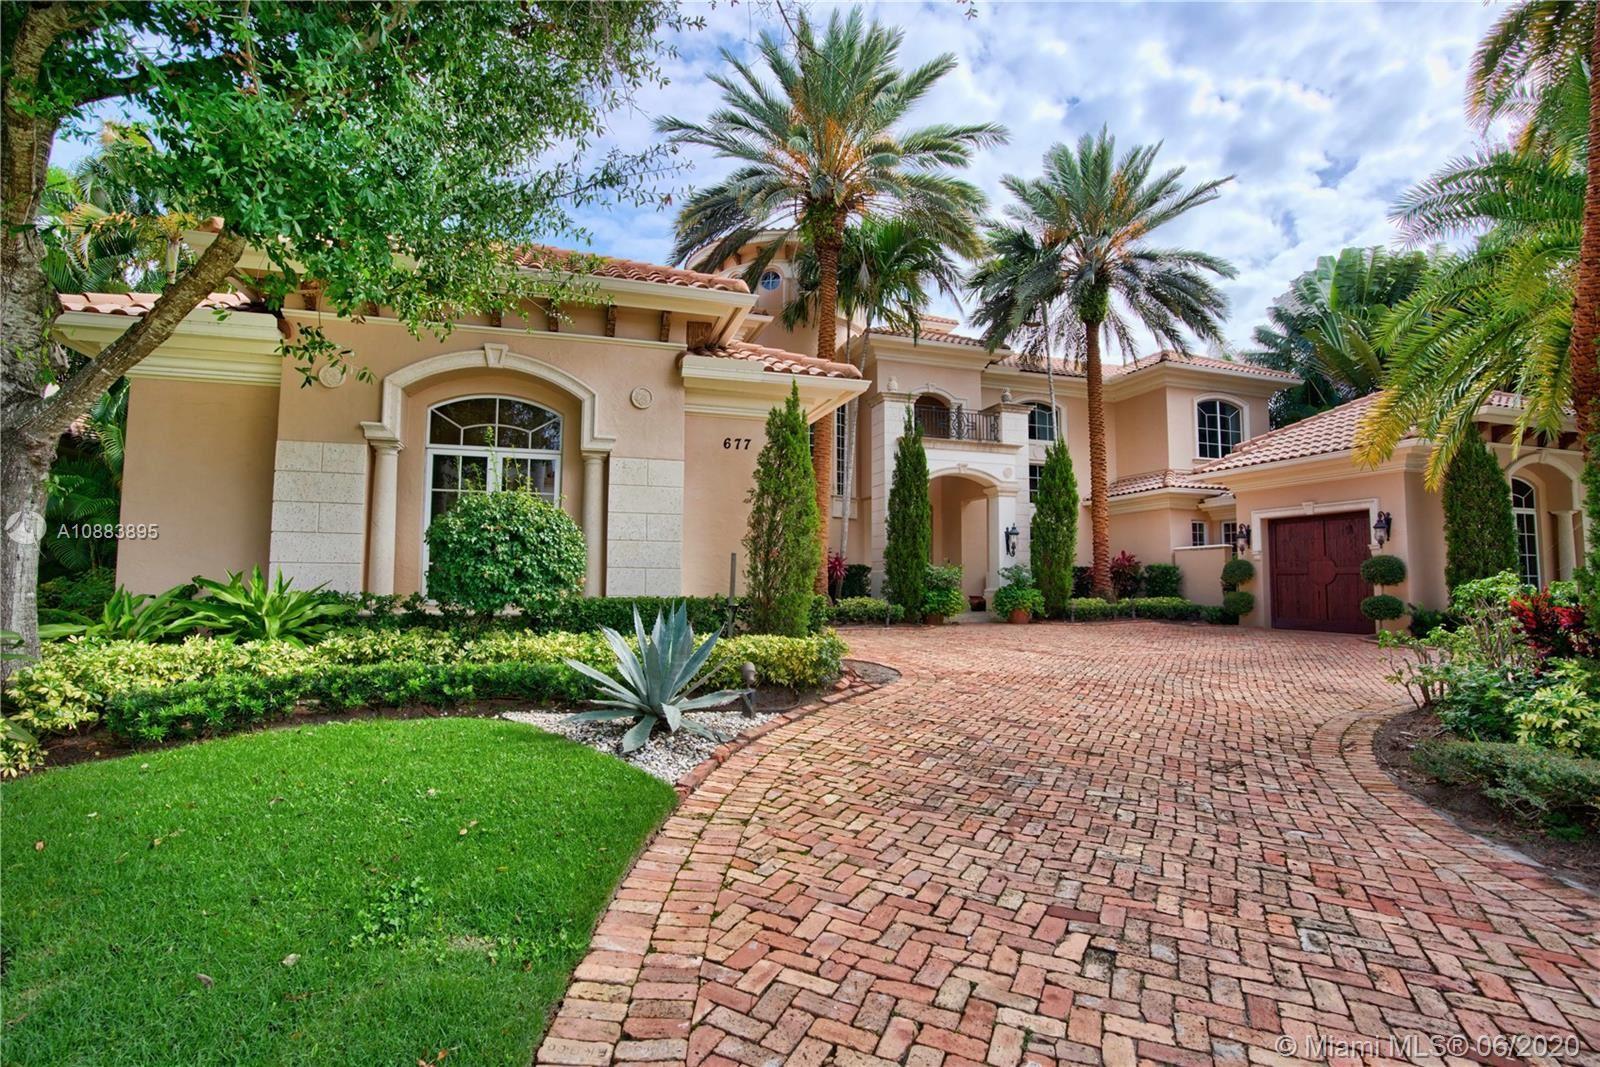 677 Hermitage Cir, Palm Beach Gardens, FL 33410 - #: A10883895